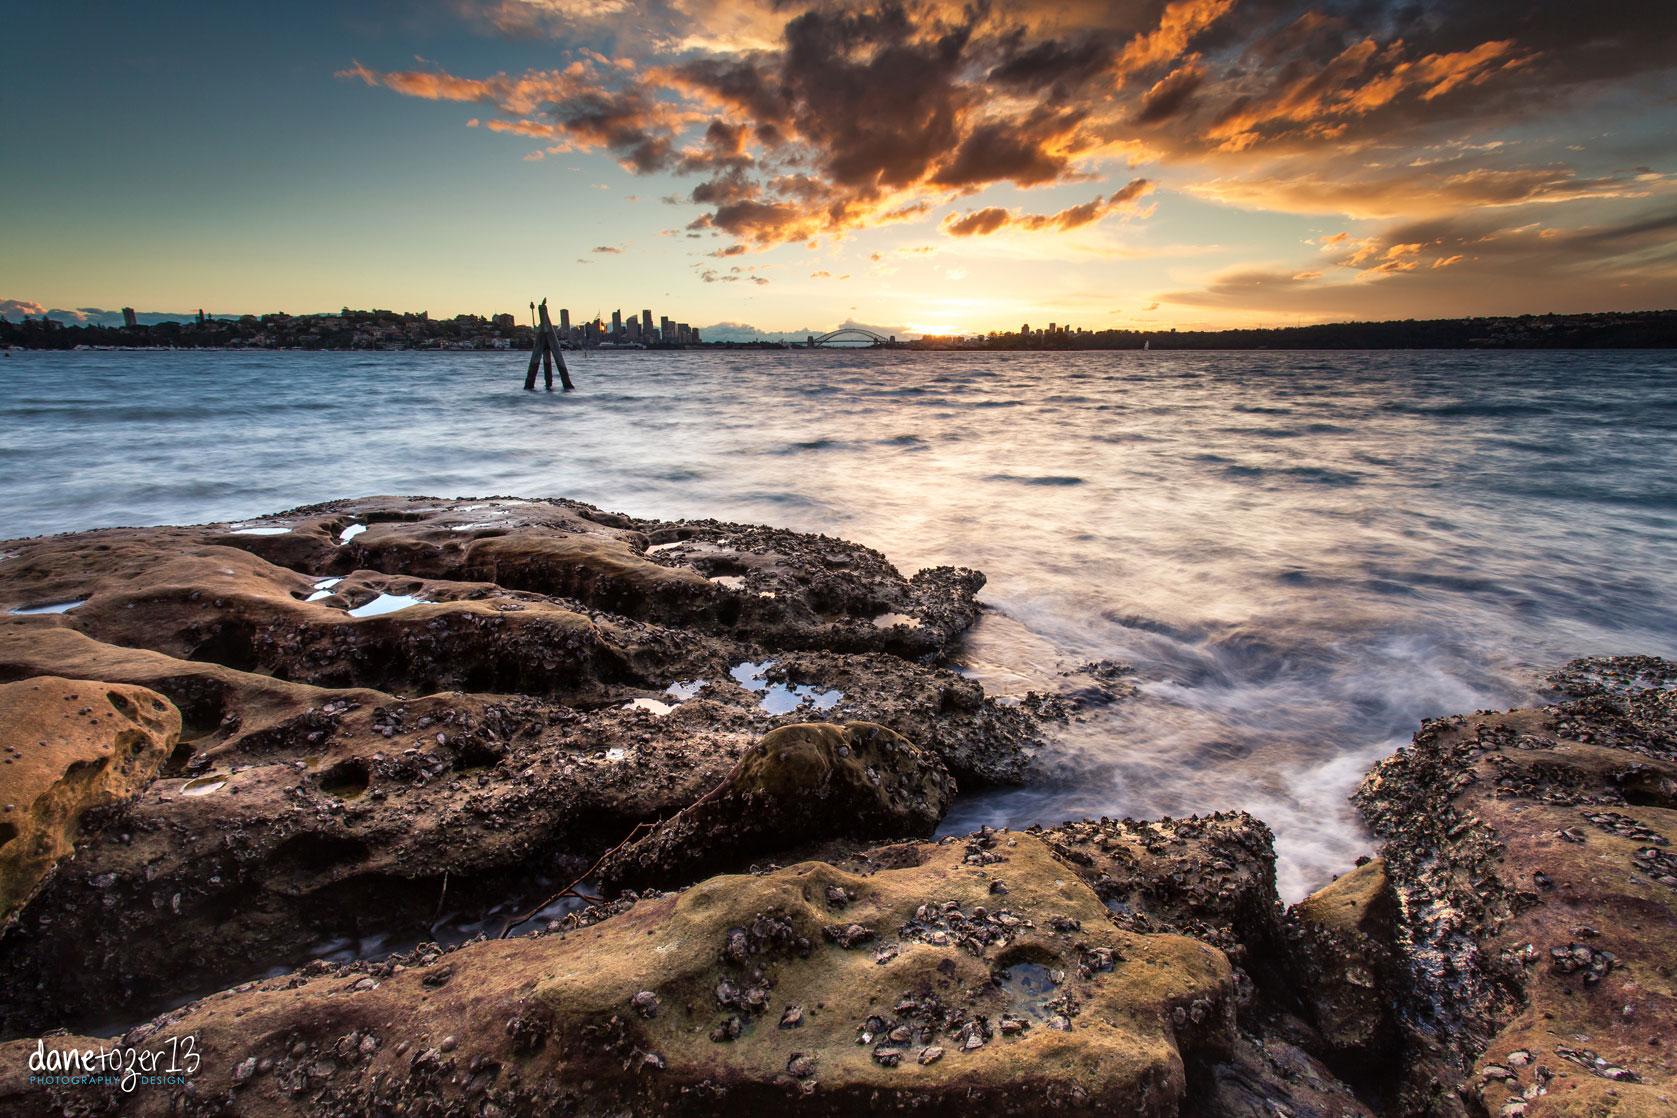 Queens Beach, Vaucluse NSW